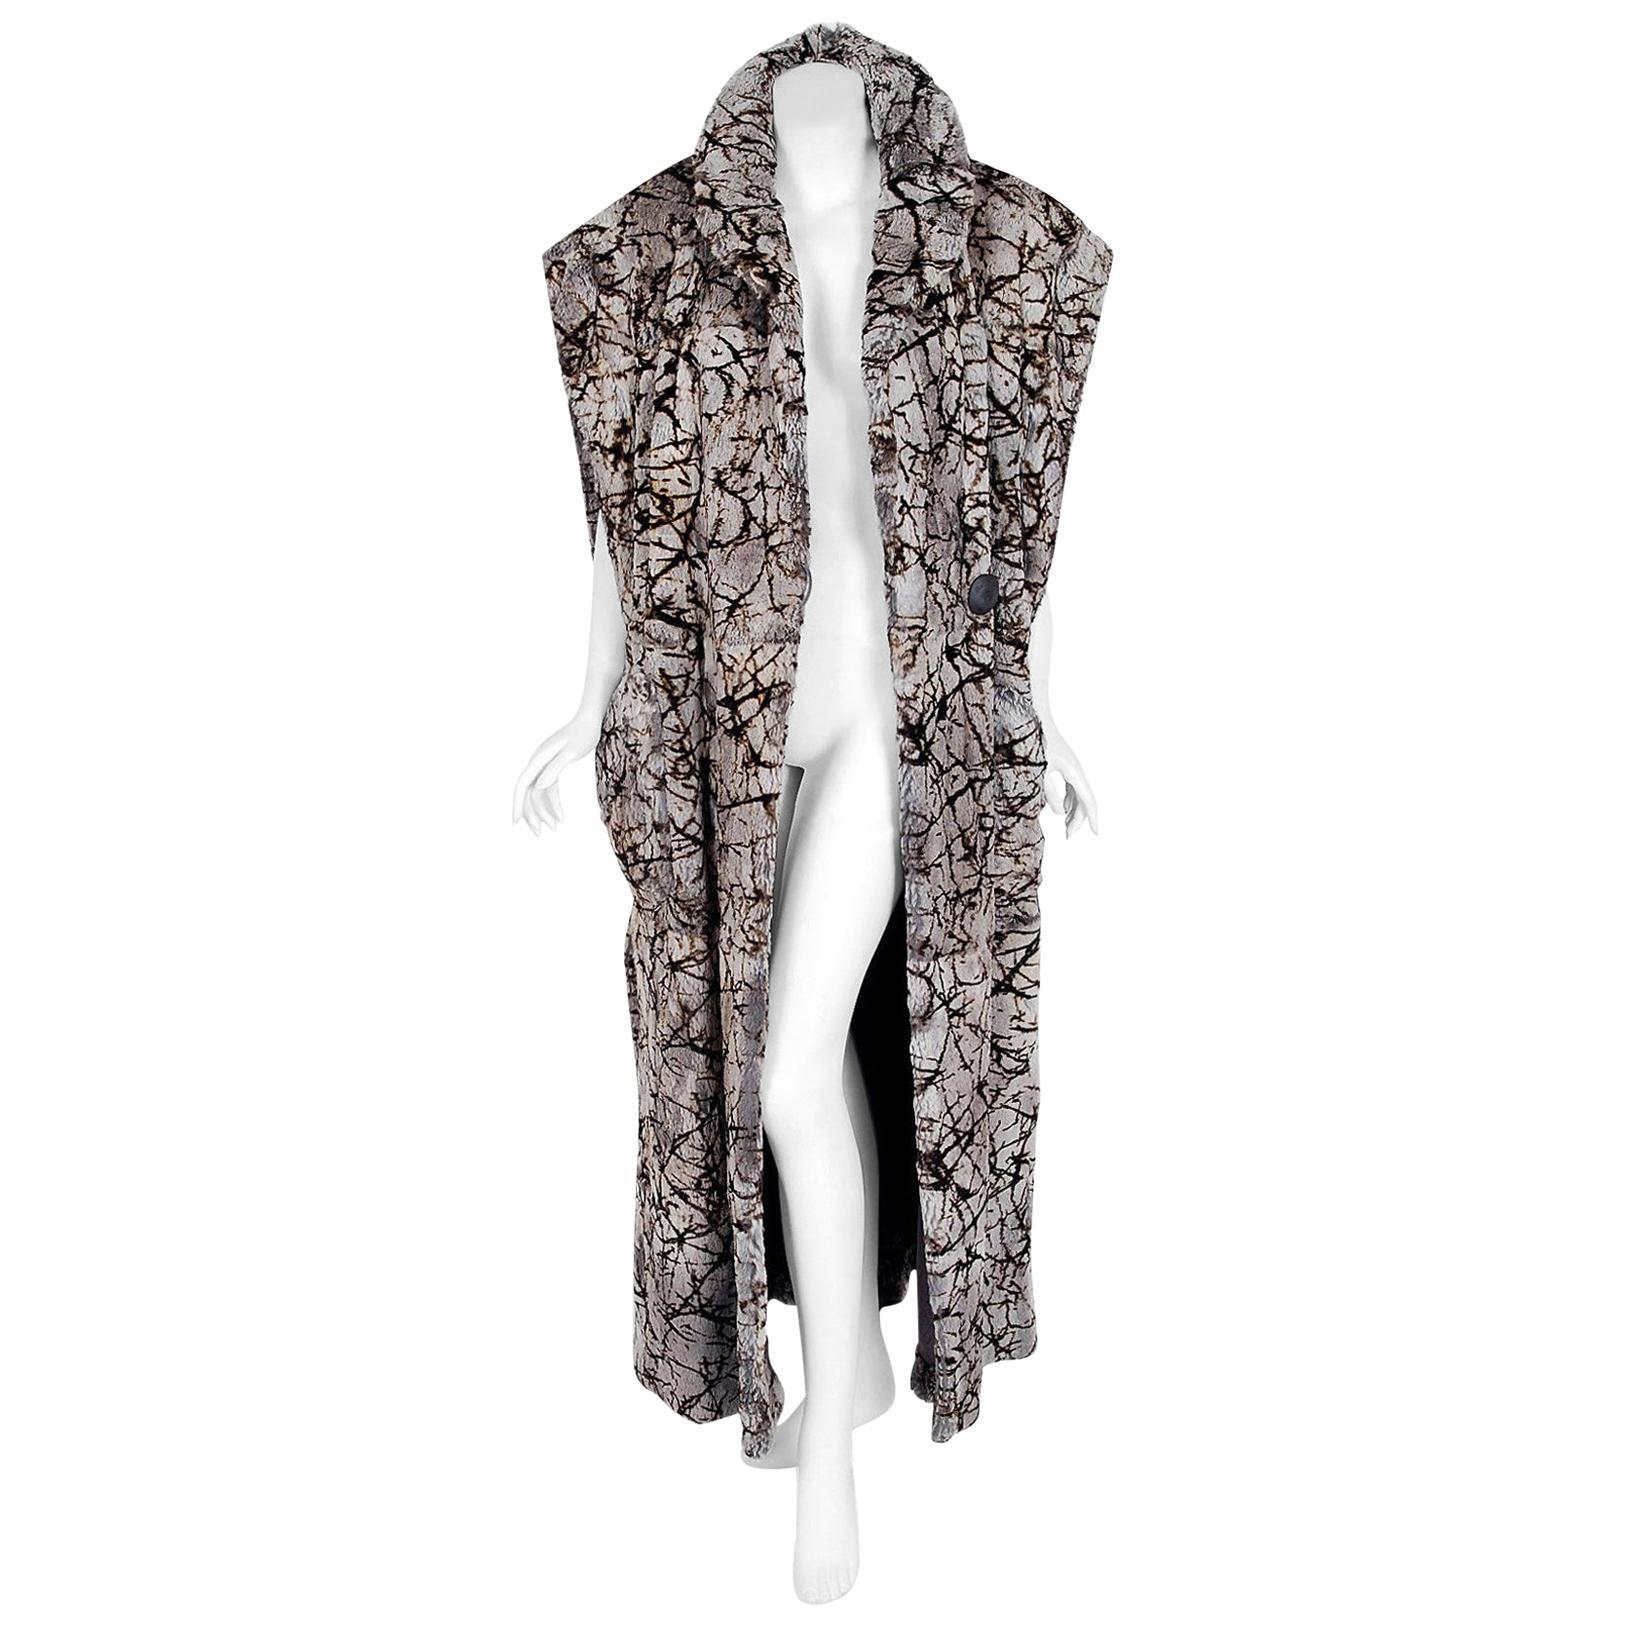 Vintage 1978 Fendi Couture by Karl Lagerfeld Chinchilla Fur Maxi Jacket Vest